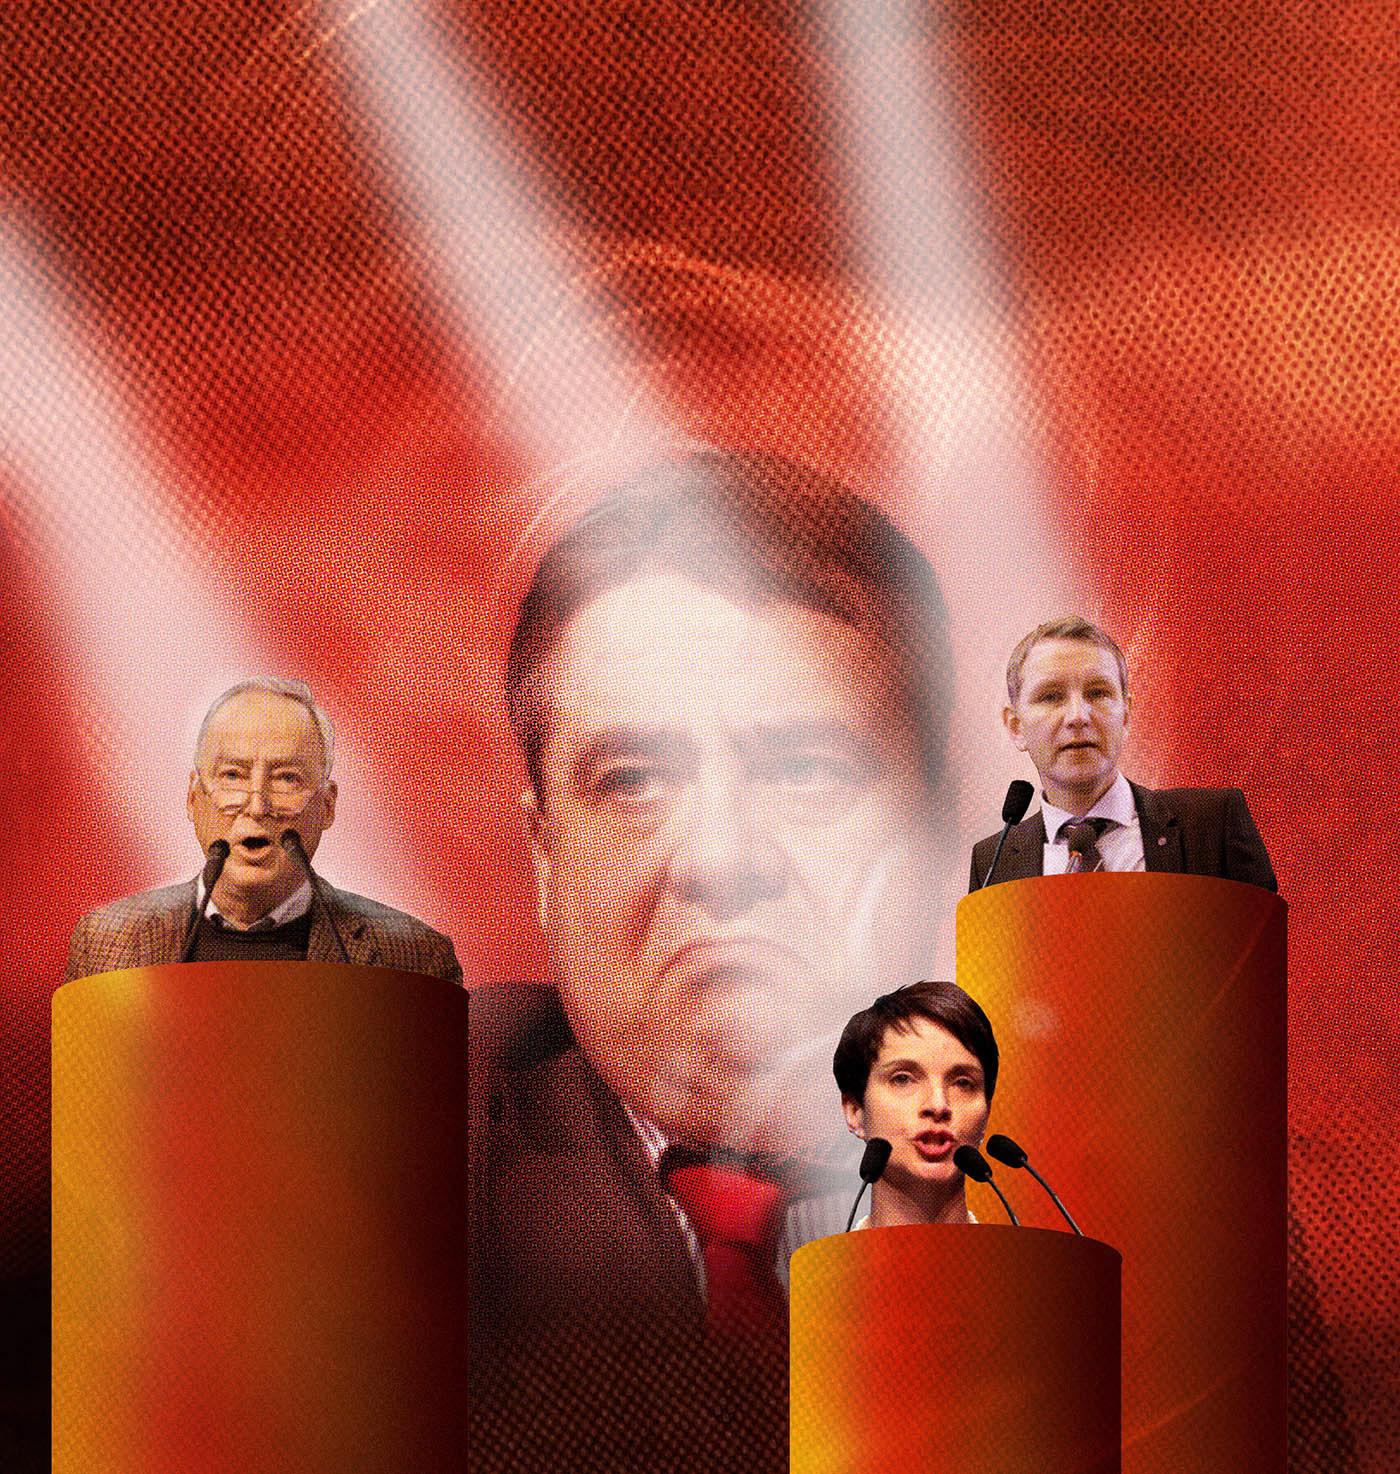 Sigmar Gabriel's right wing opponent AFD  politicians Frauke Petry, Alexander Gauland, Björn Höcke